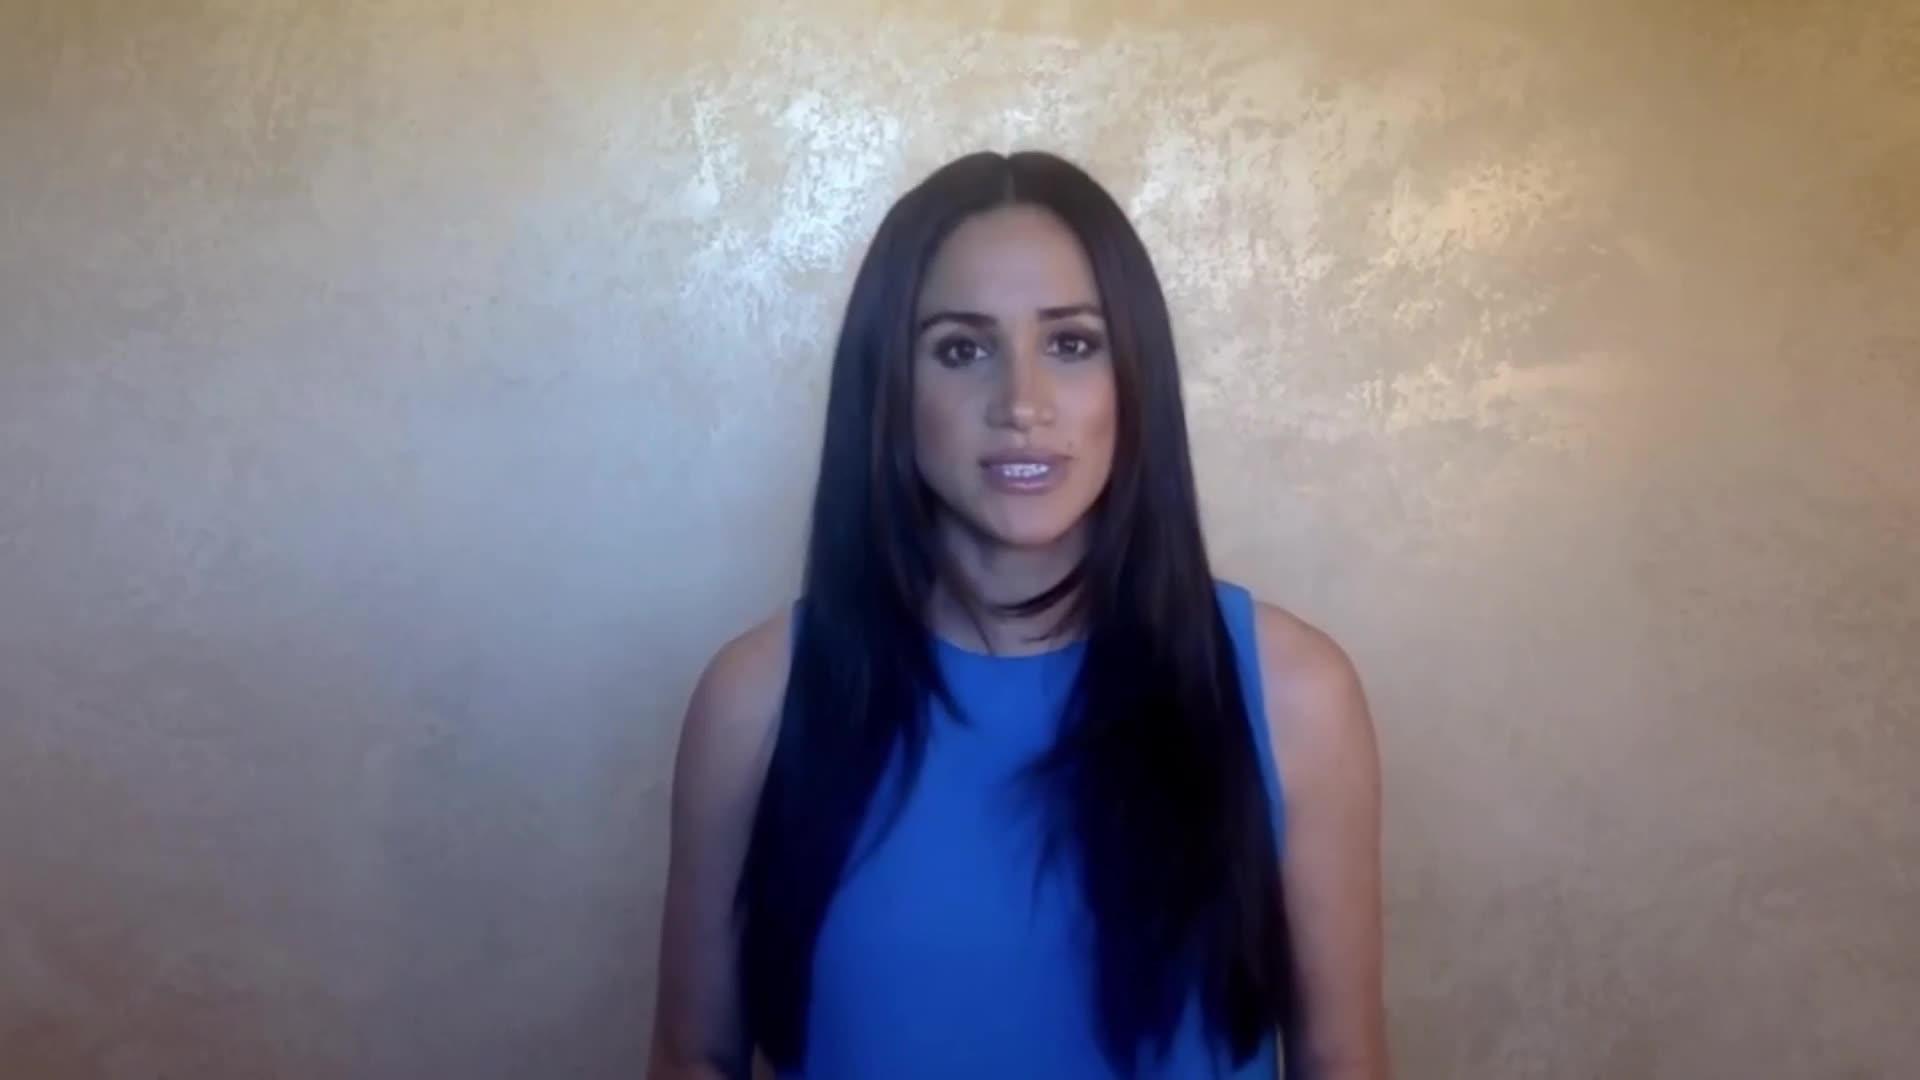 Meghan Markle dio un discurso conmovedor - TN.com.ar